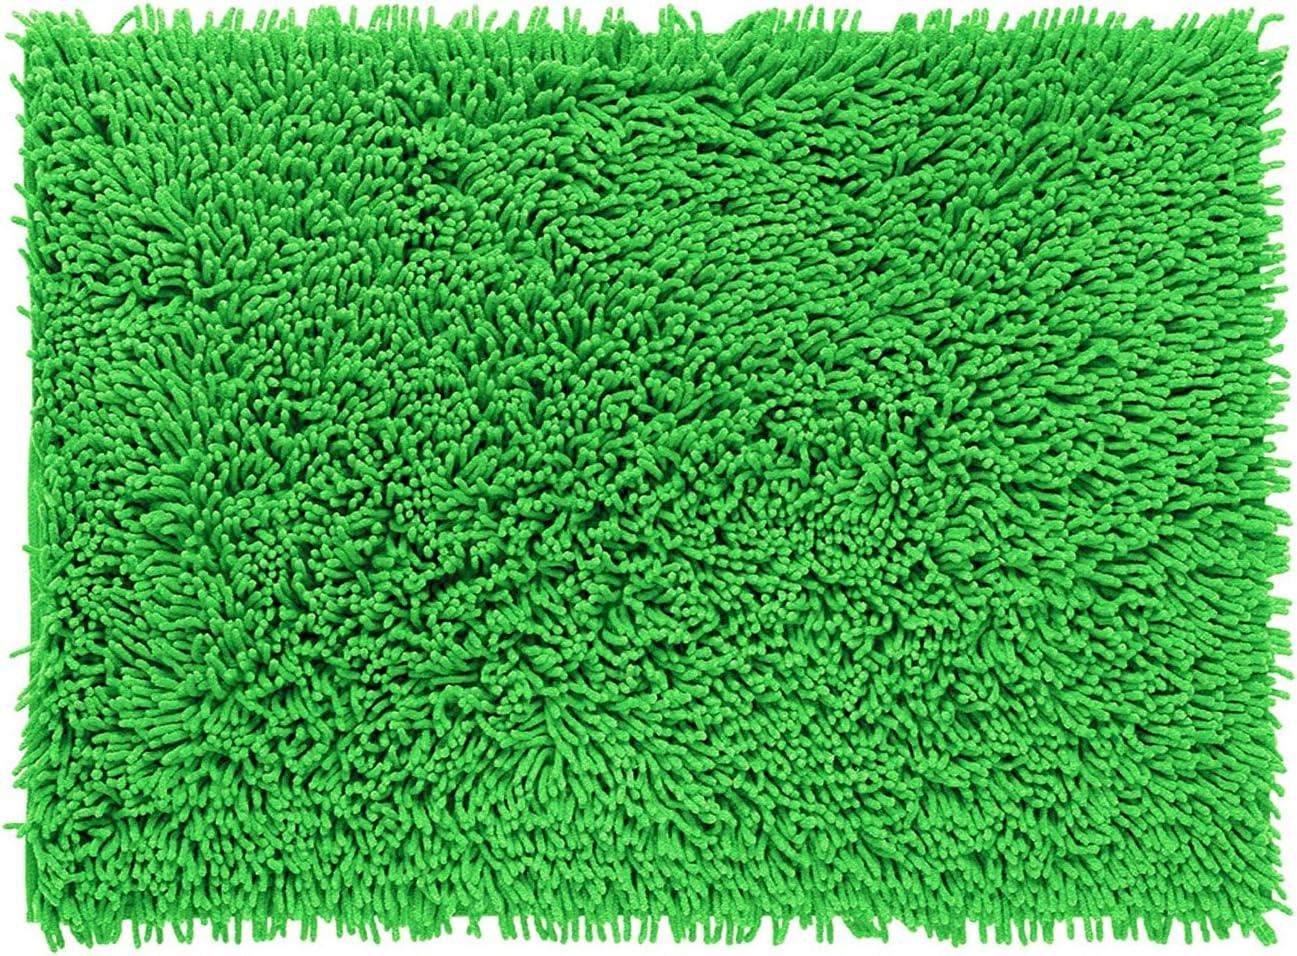 Alfombrista Gloria Alfombra, Algodón, Verde Benet, 120 x 180 cm: Amazon.es: Hogar